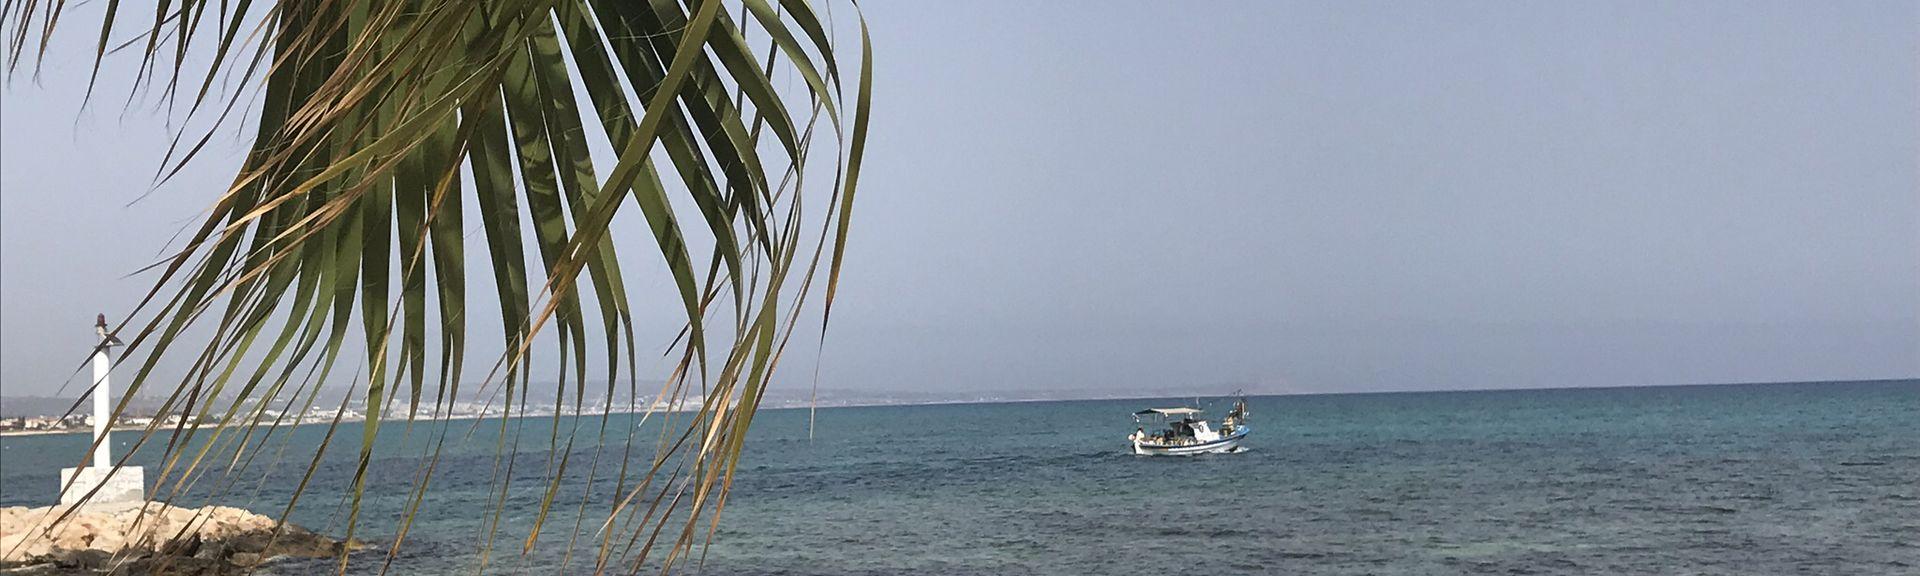 Grecian Bay Beach, Ayia Napa, Famagusta District, Cyprus